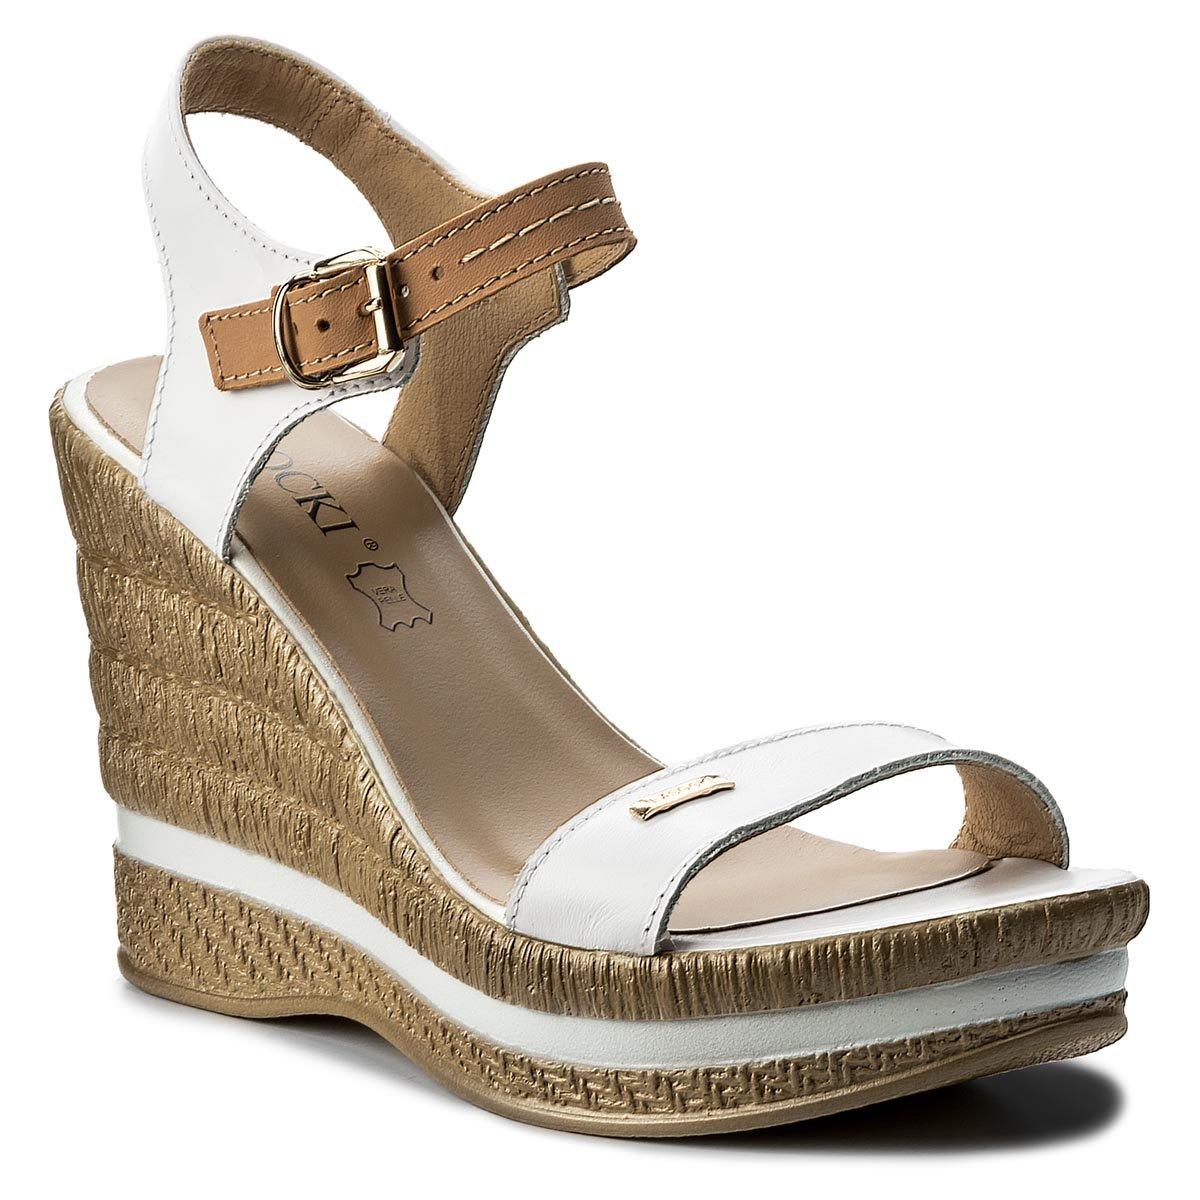 6b26417919 sandále Lasocki 565-01 biela Dámske - Topánky - Sandále - https   ccc.eu